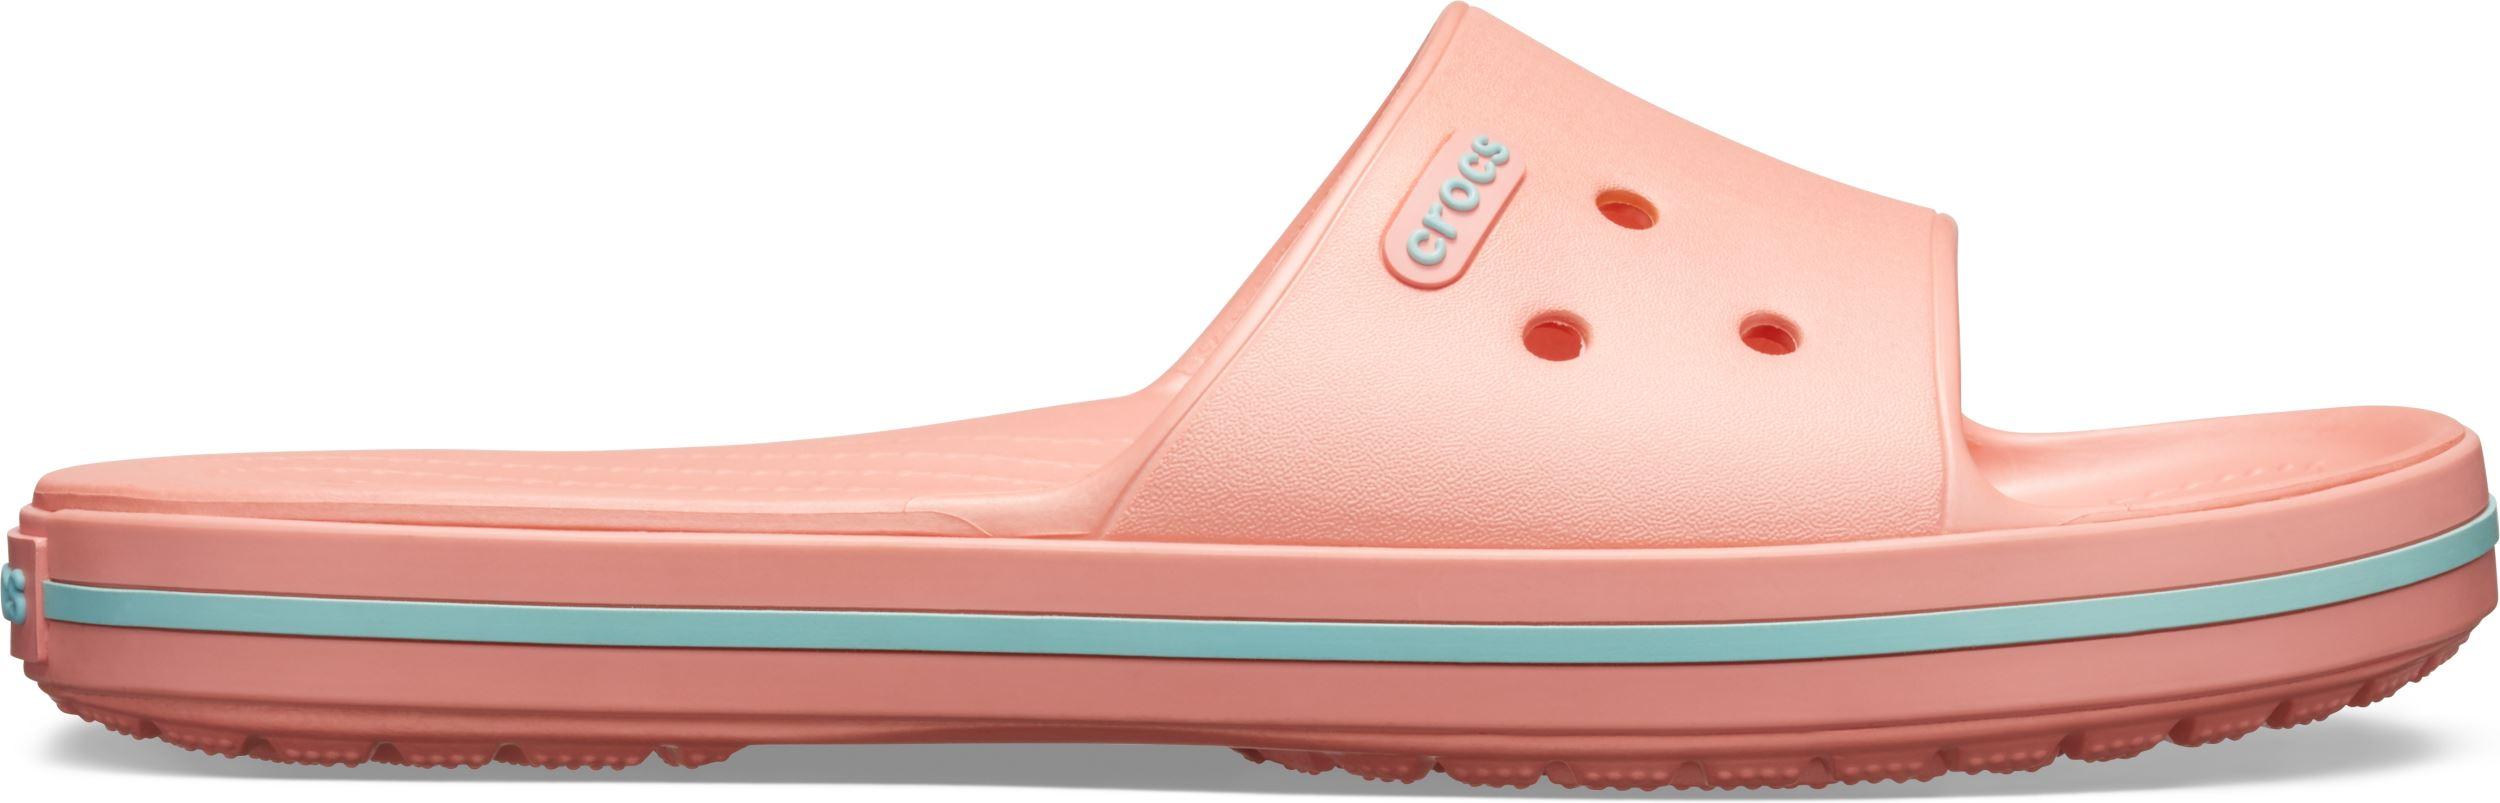 5b366eb8dbd04 Dámske šľapky Crocs Crocband III Slide melónovo ružová / modrá | hs ...